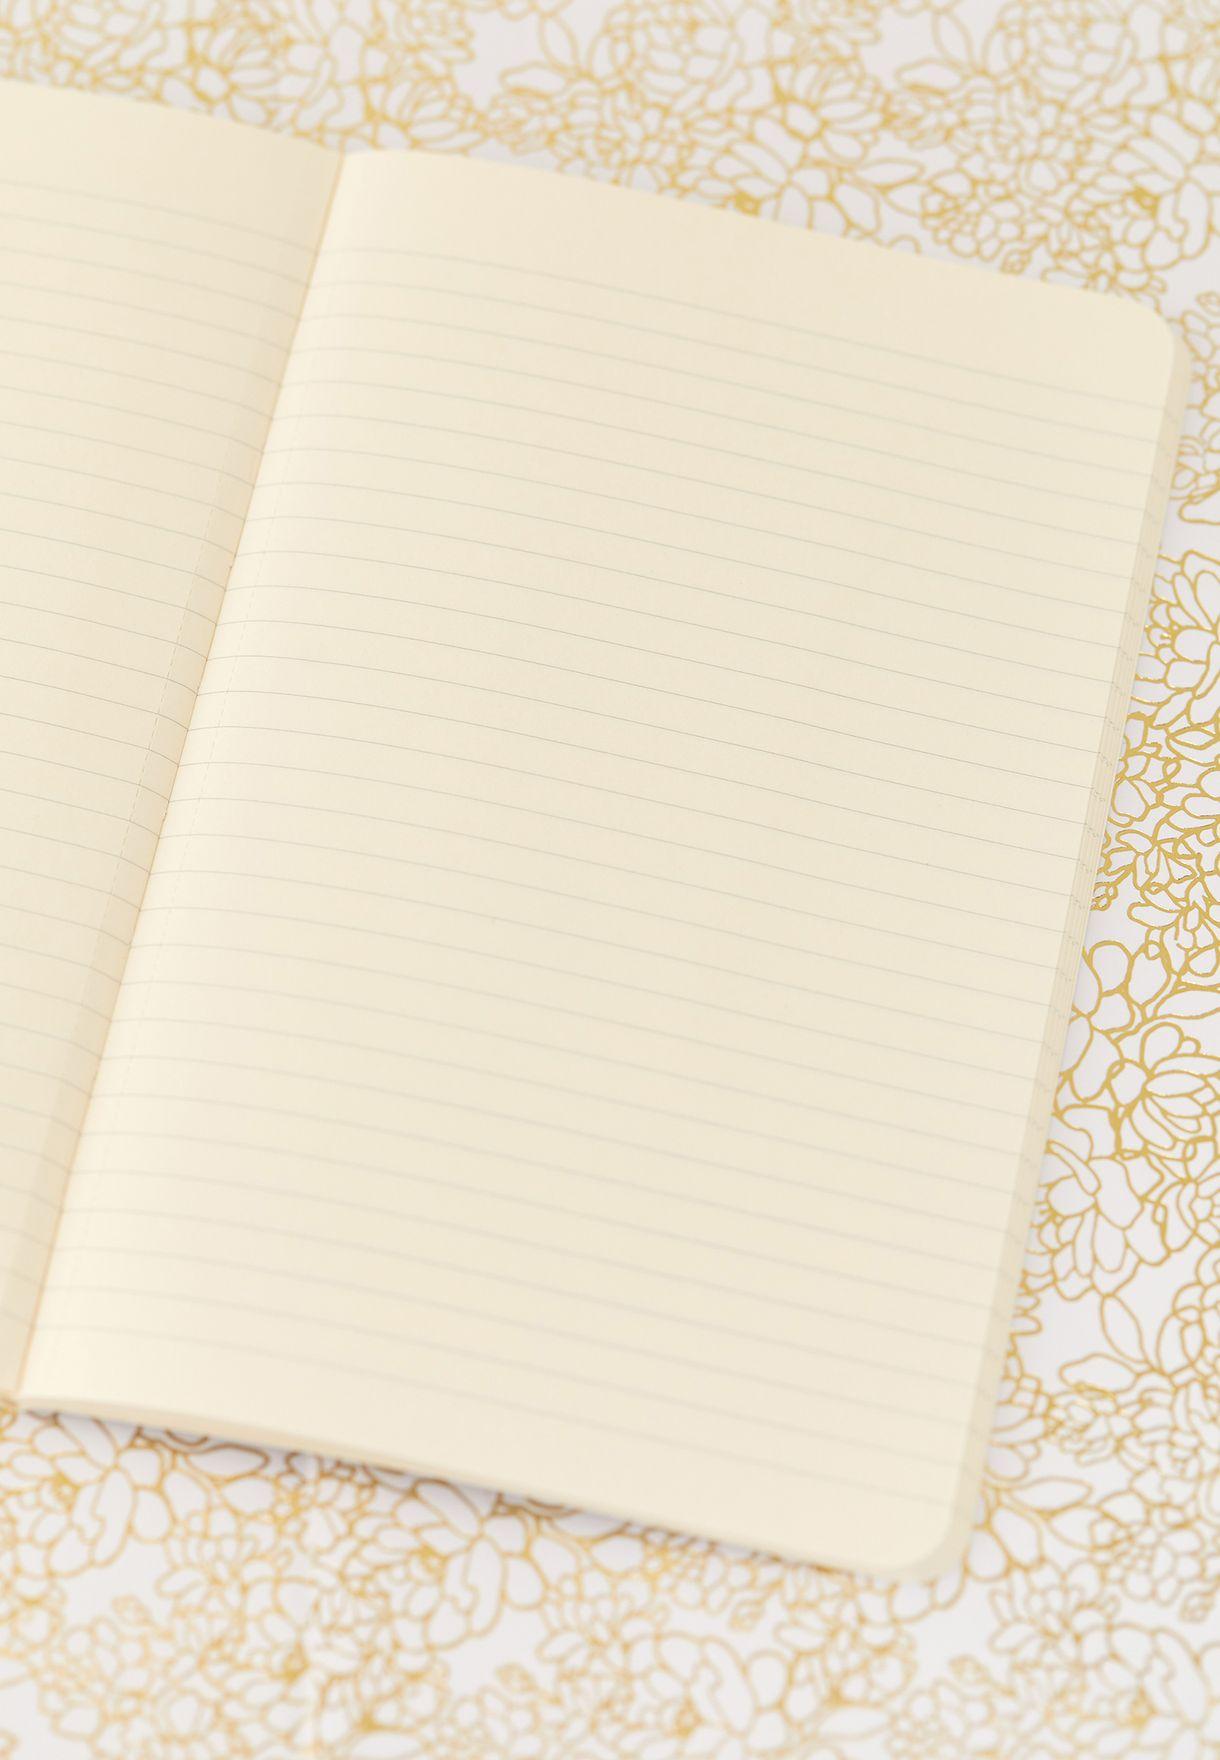 Large Volant Journal